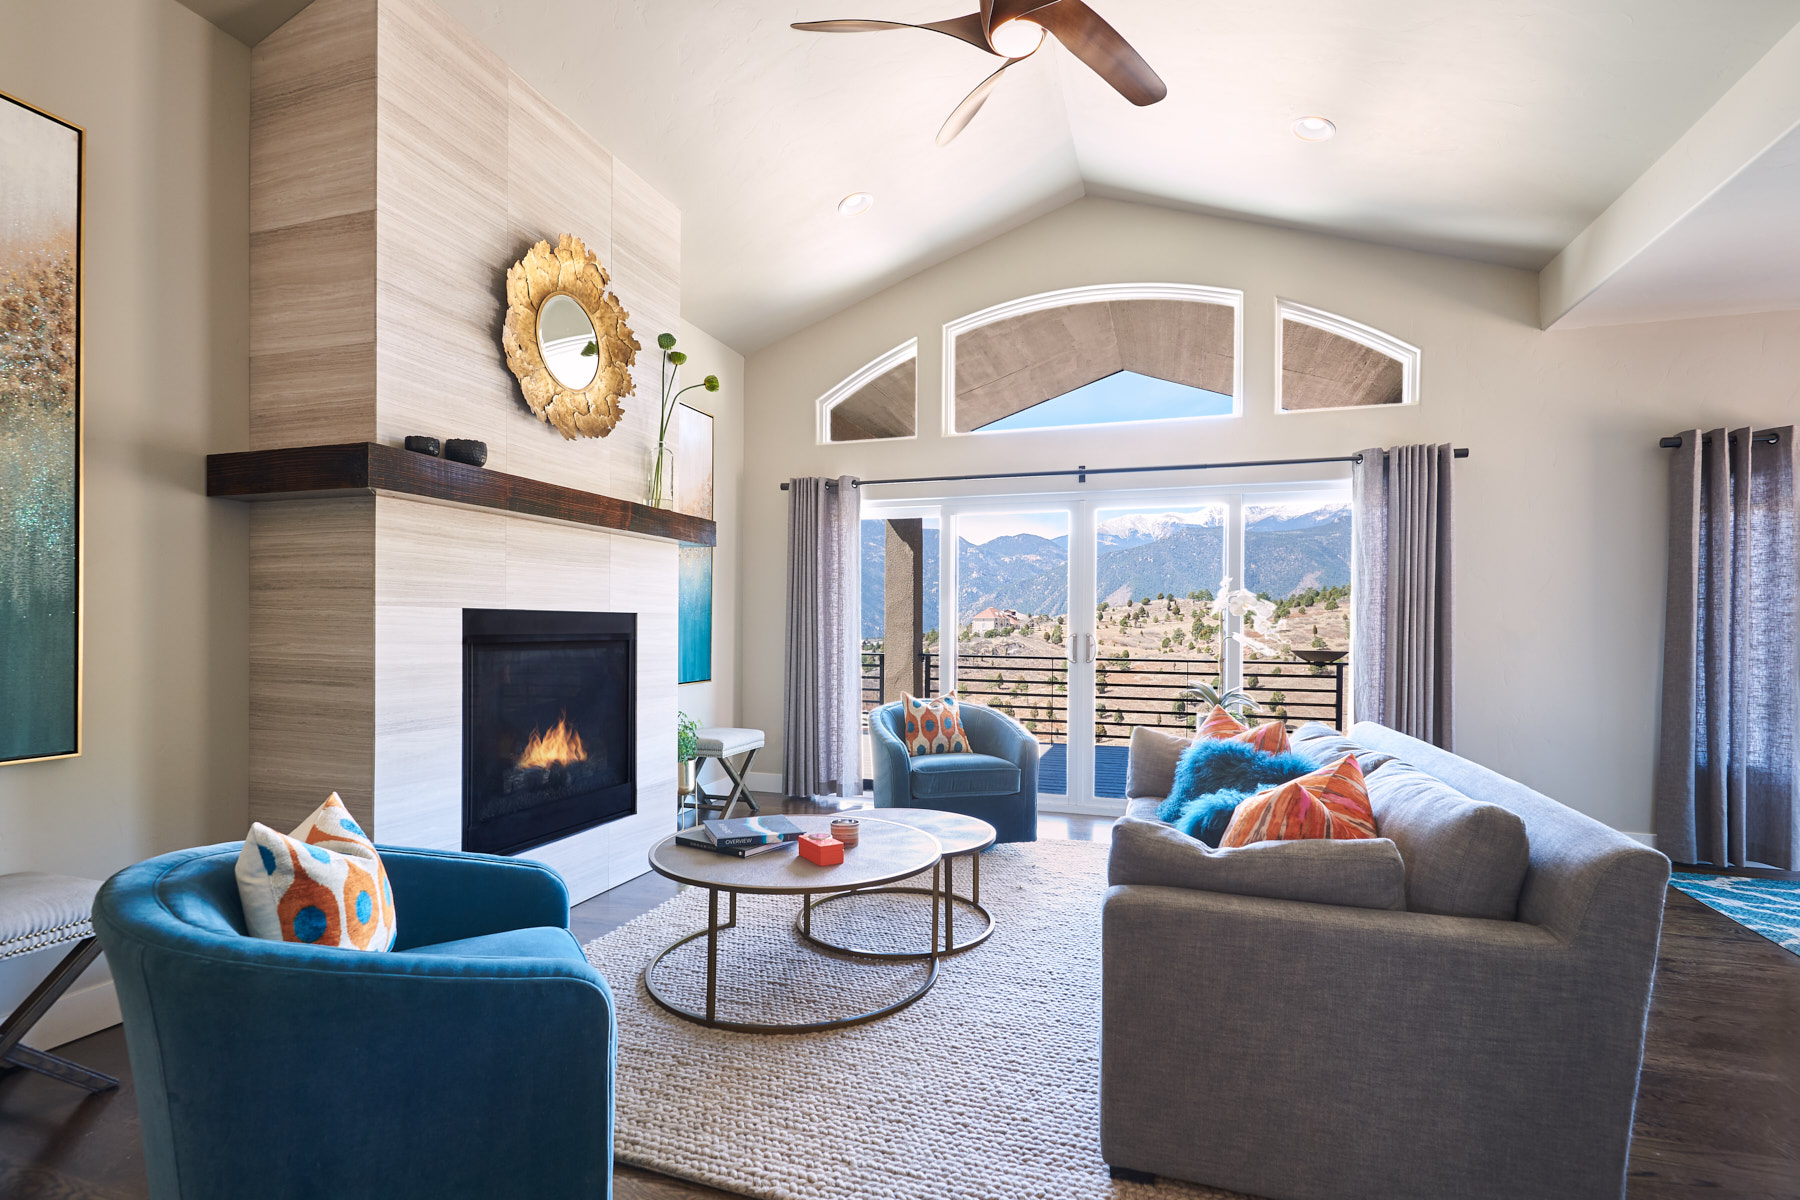 Premier interior design and furniture decorating Denver, CO furnishings